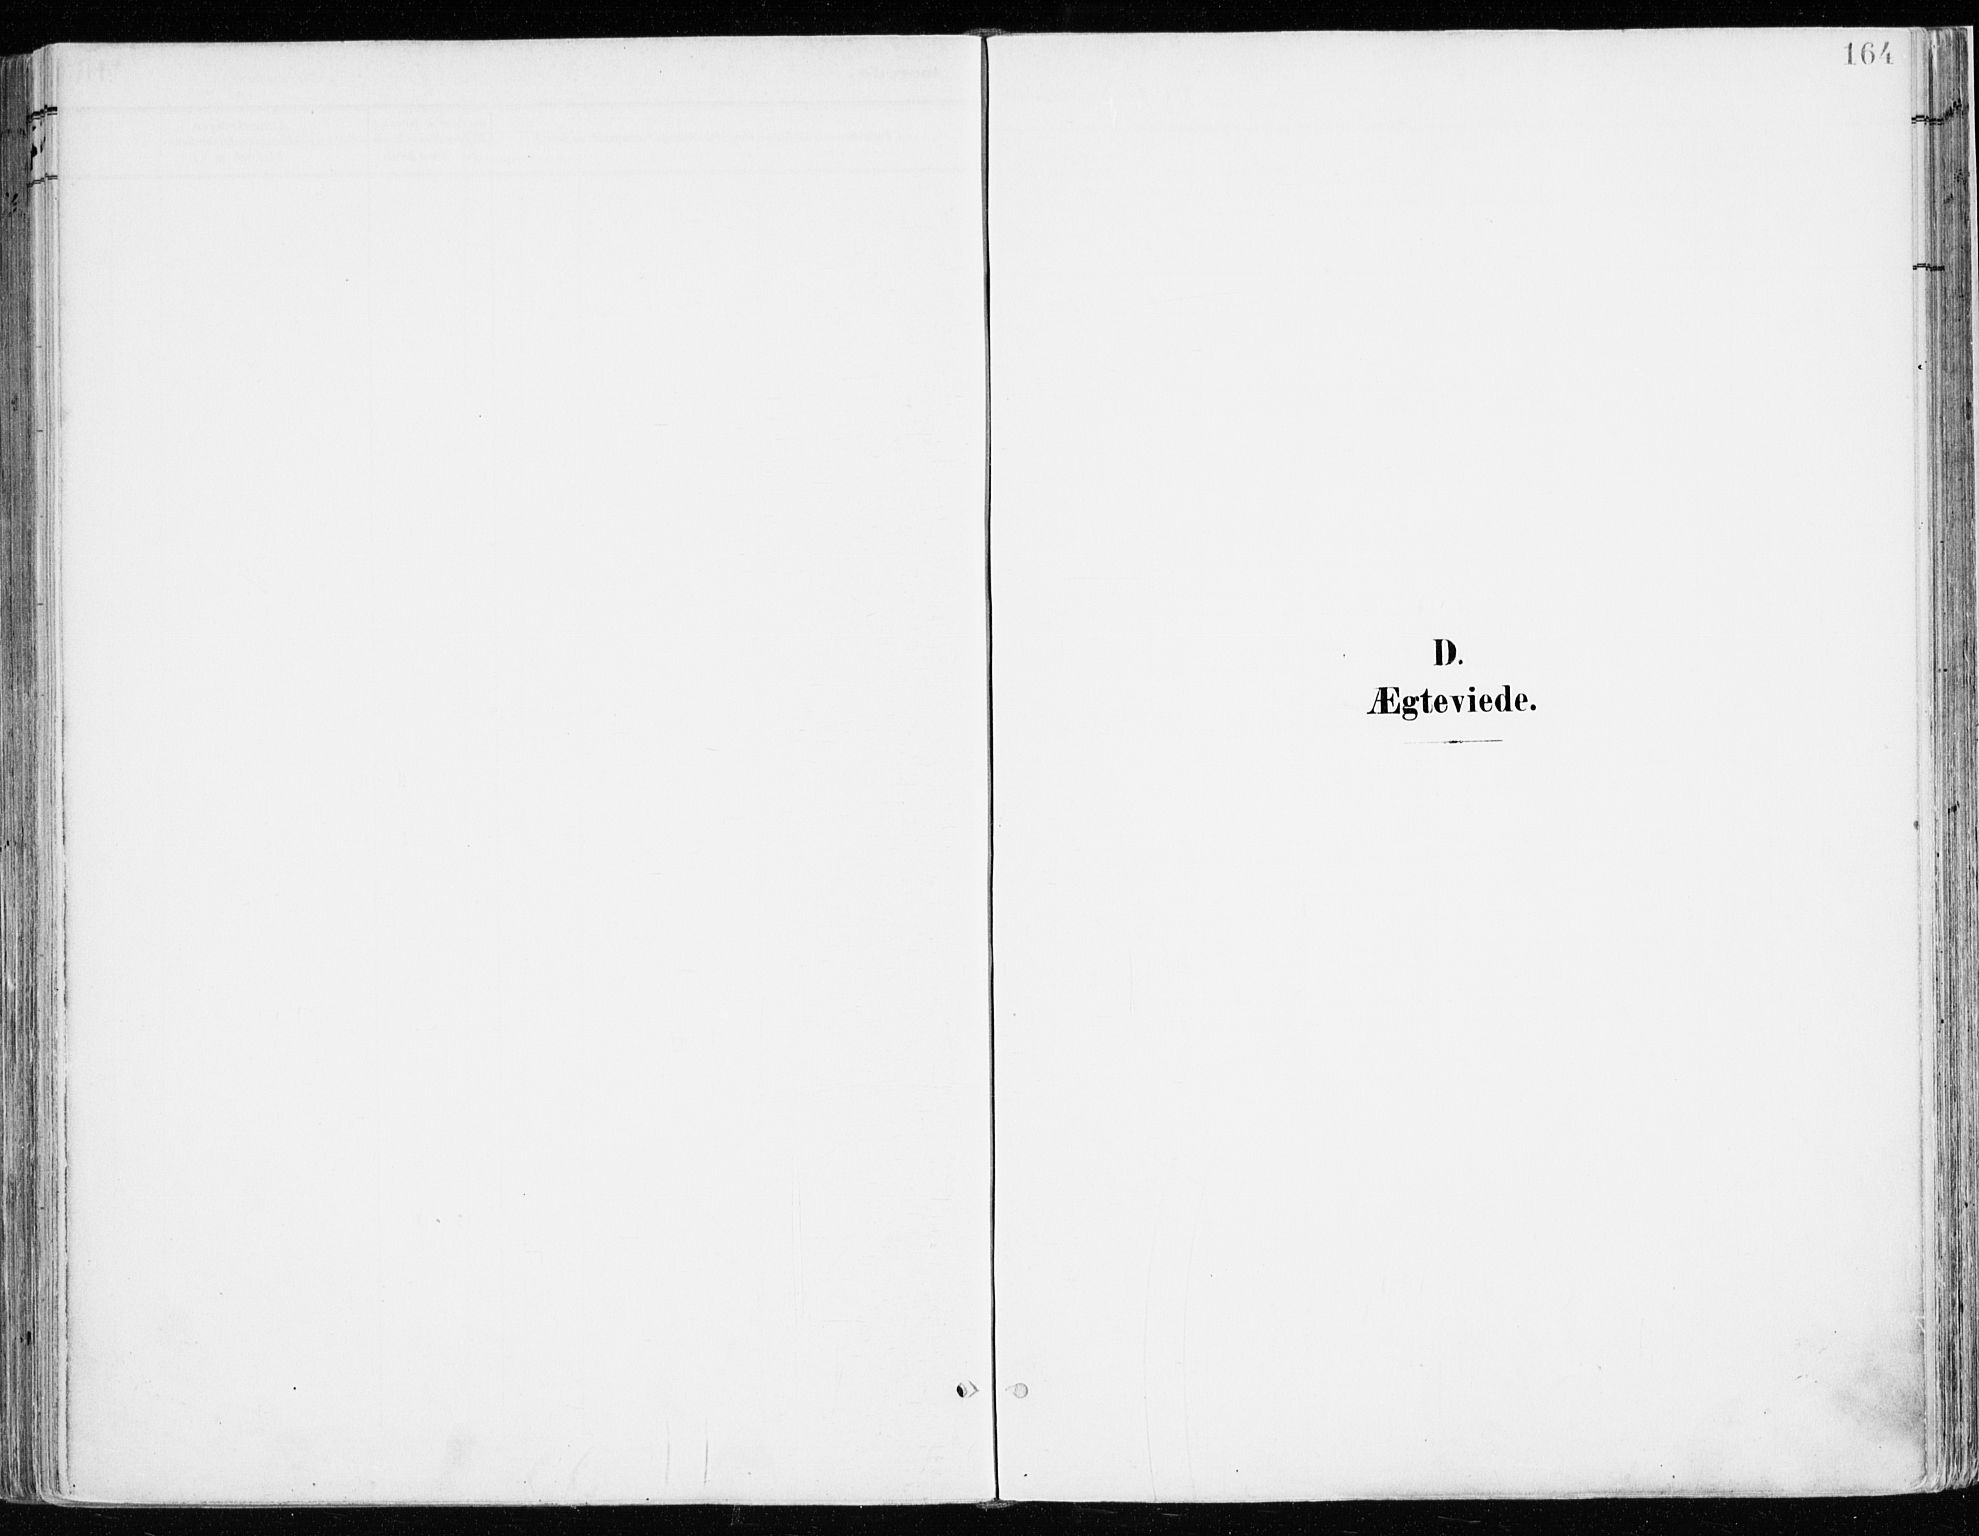 SAH, Nord-Odal prestekontor, Ministerialbok nr. 9, 1902-1926, s. 164